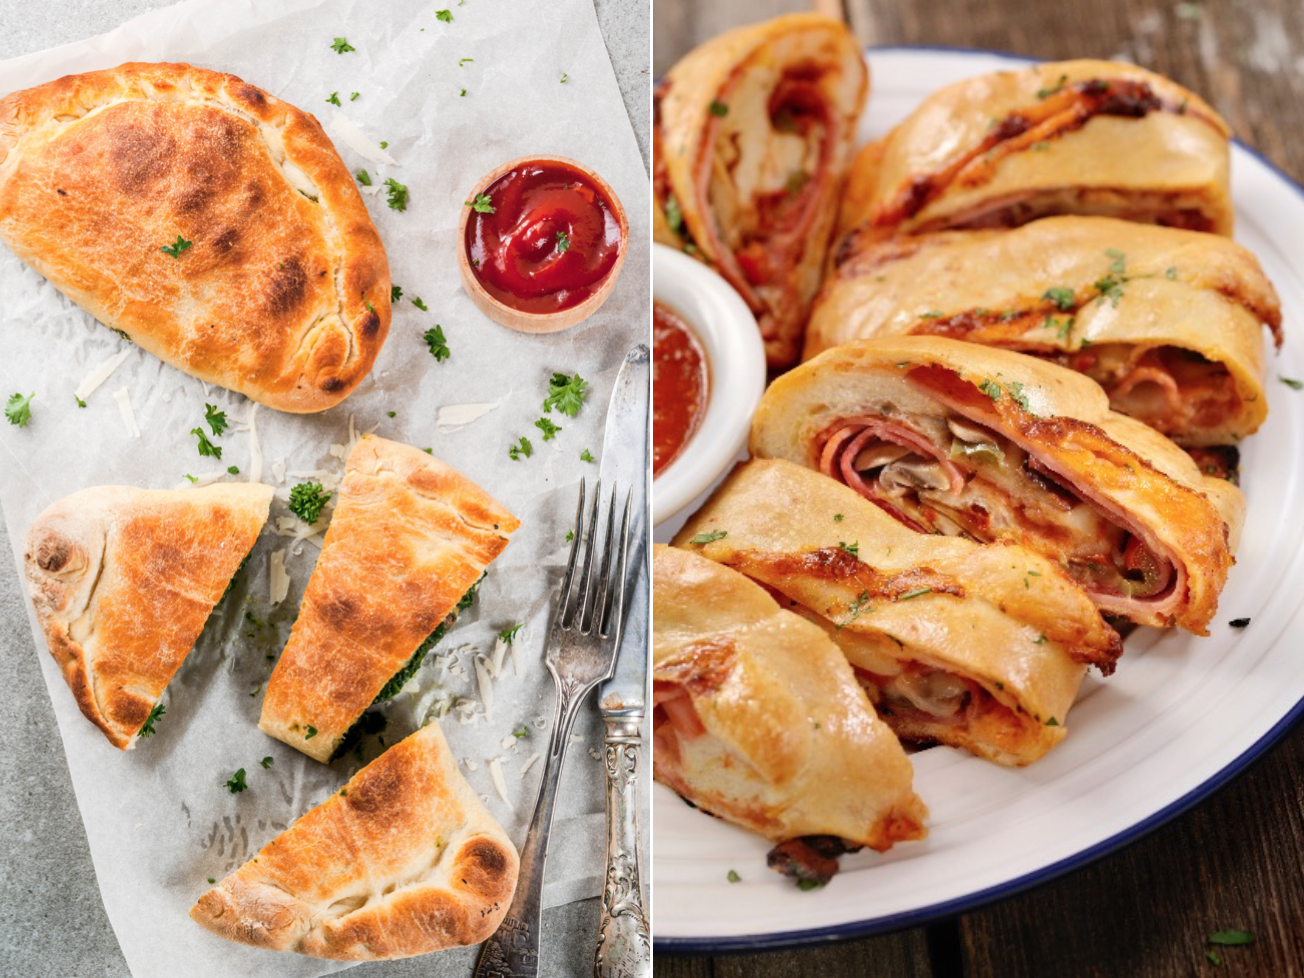 Stromboli and calzone